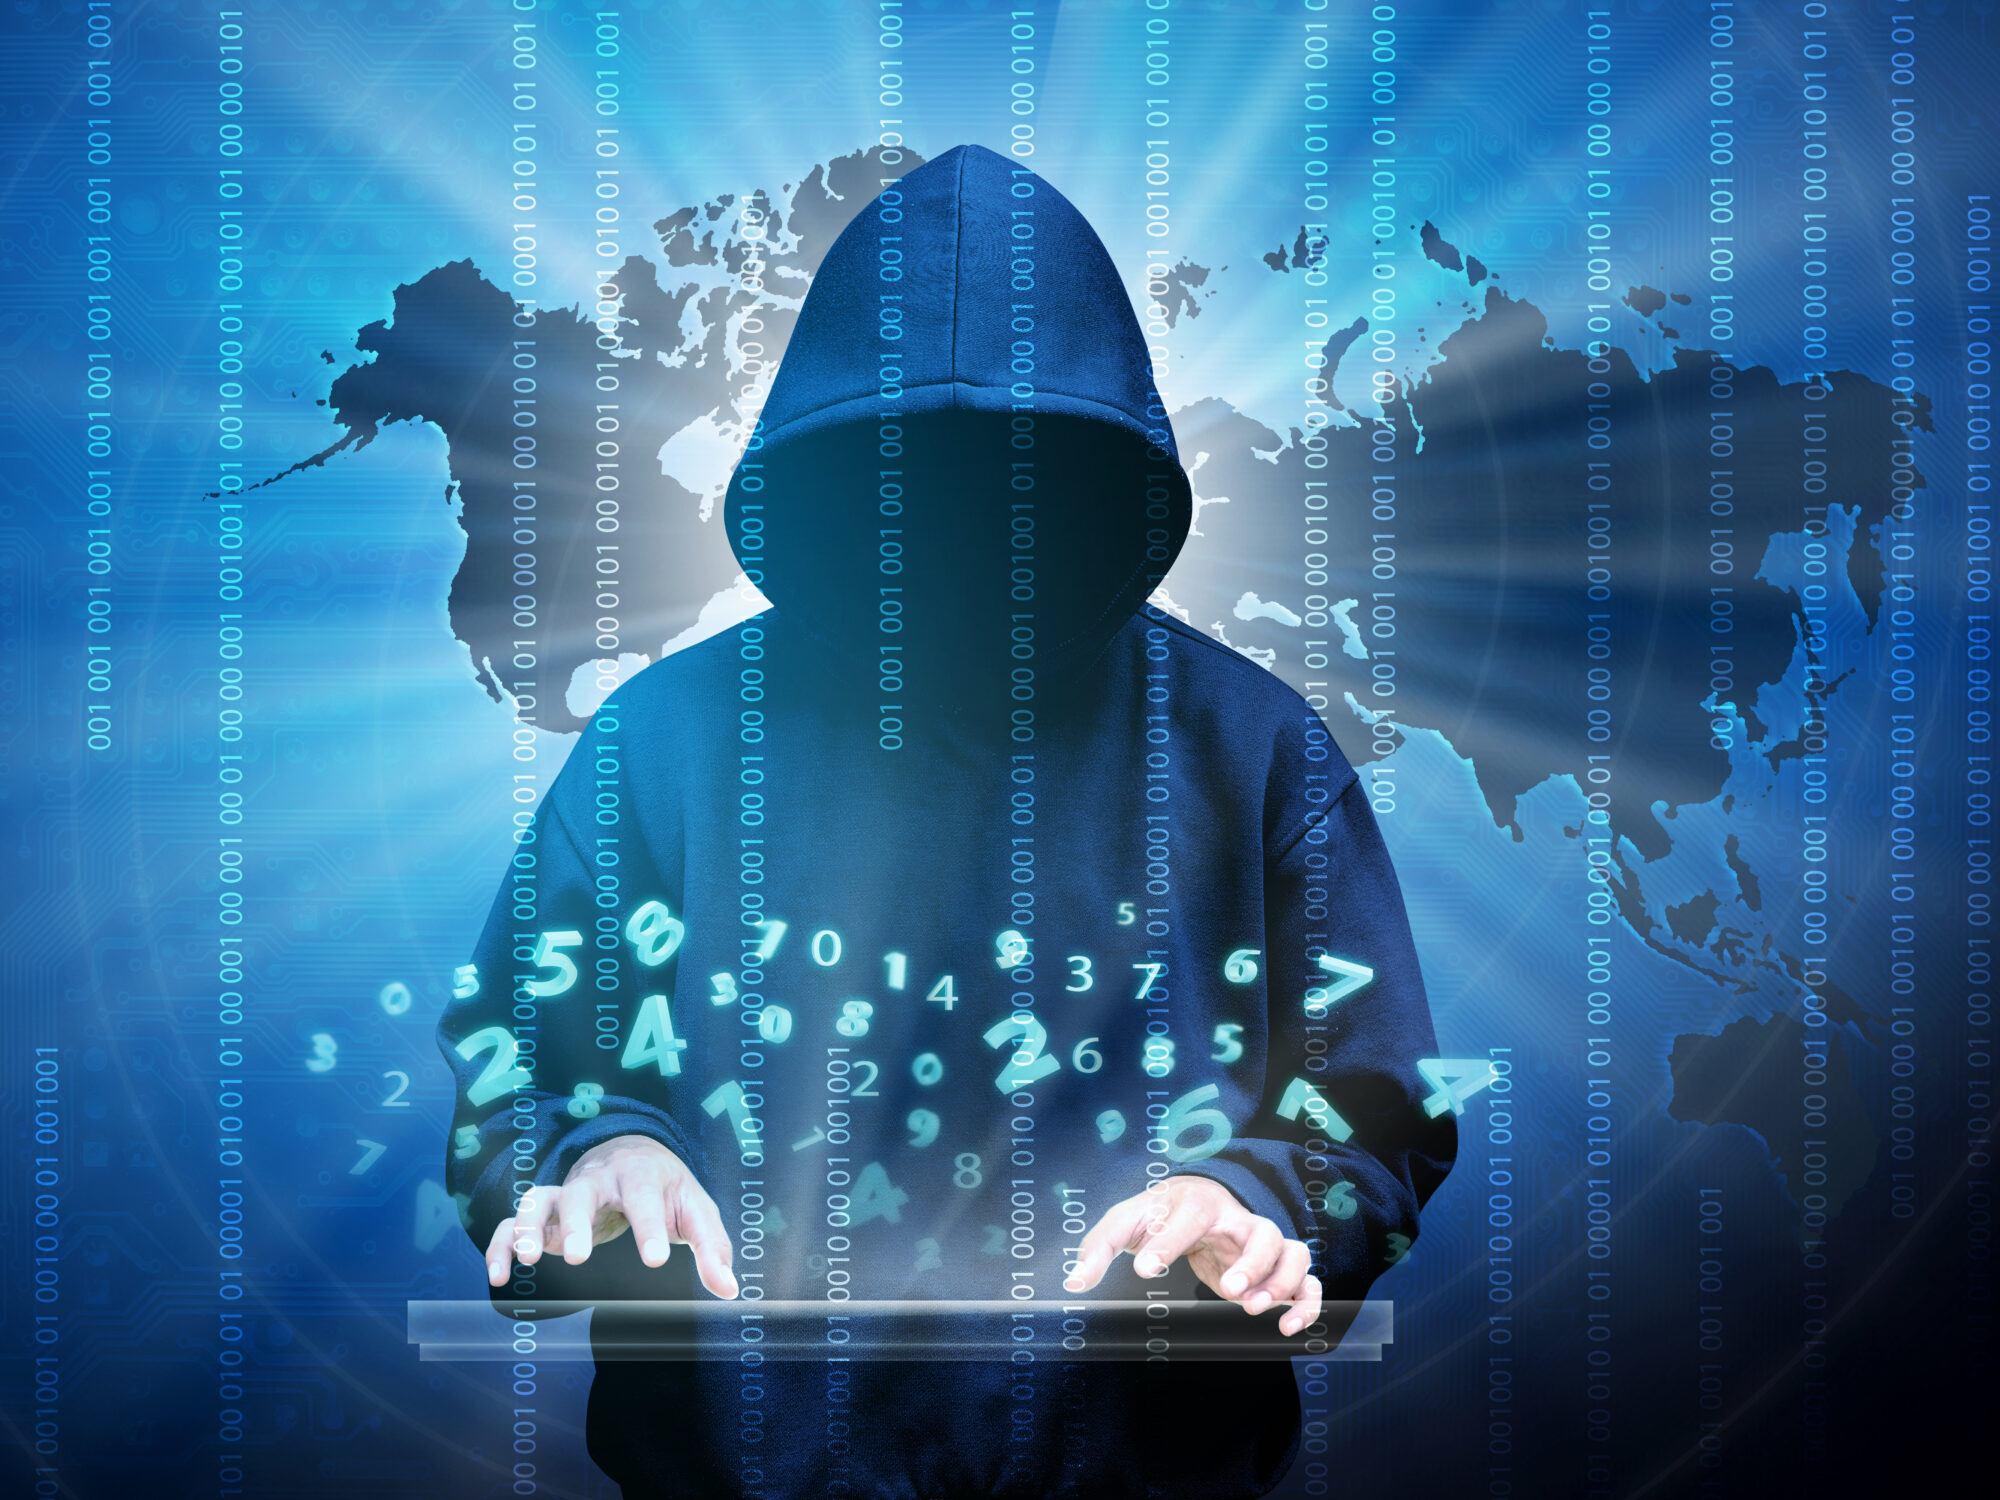 Cybercrime-verzekering